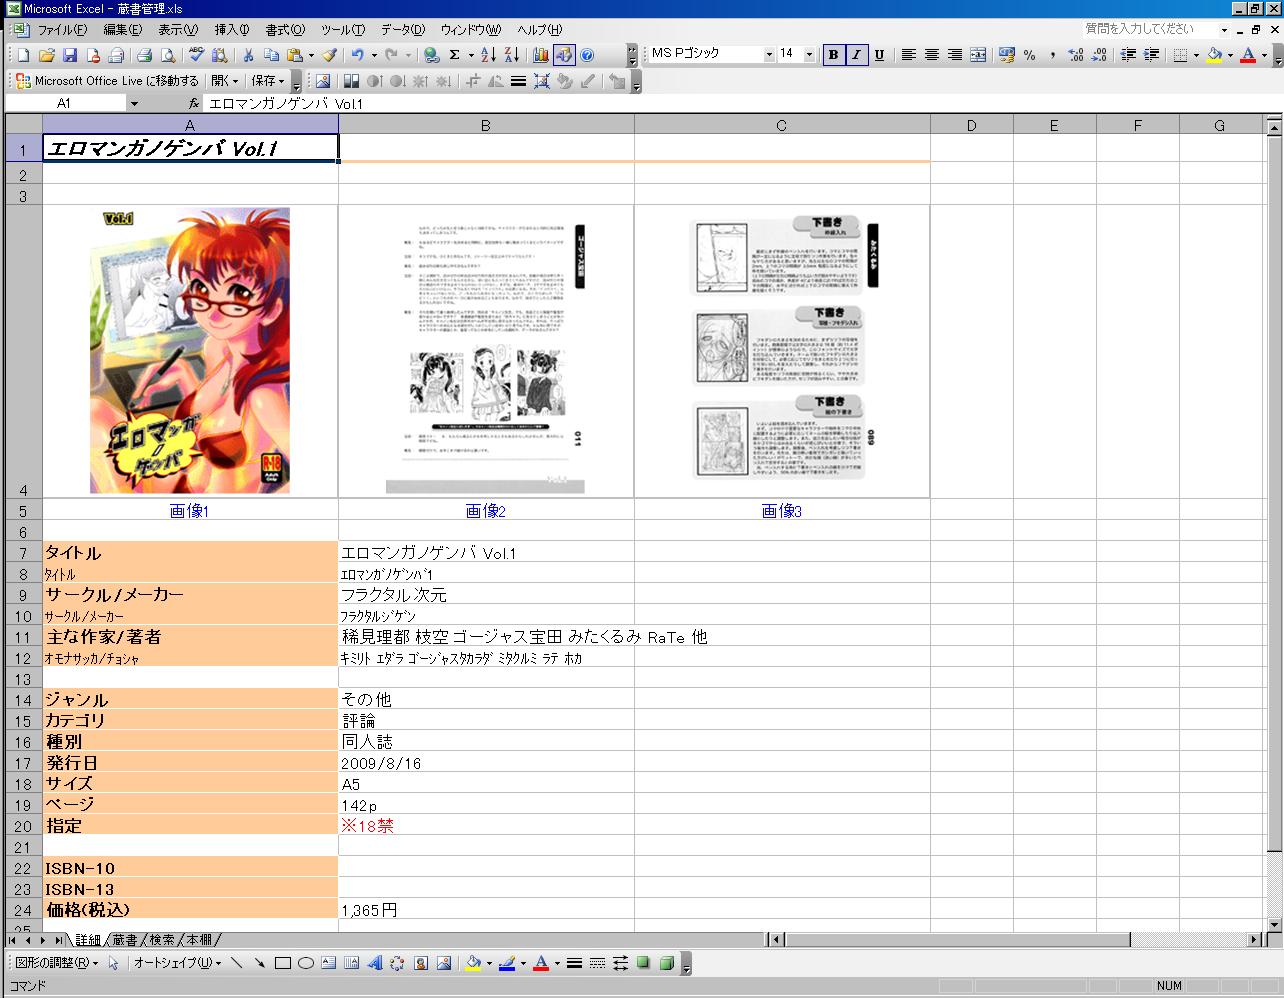 f:id:dumbo001:20120402025632p:image:w480